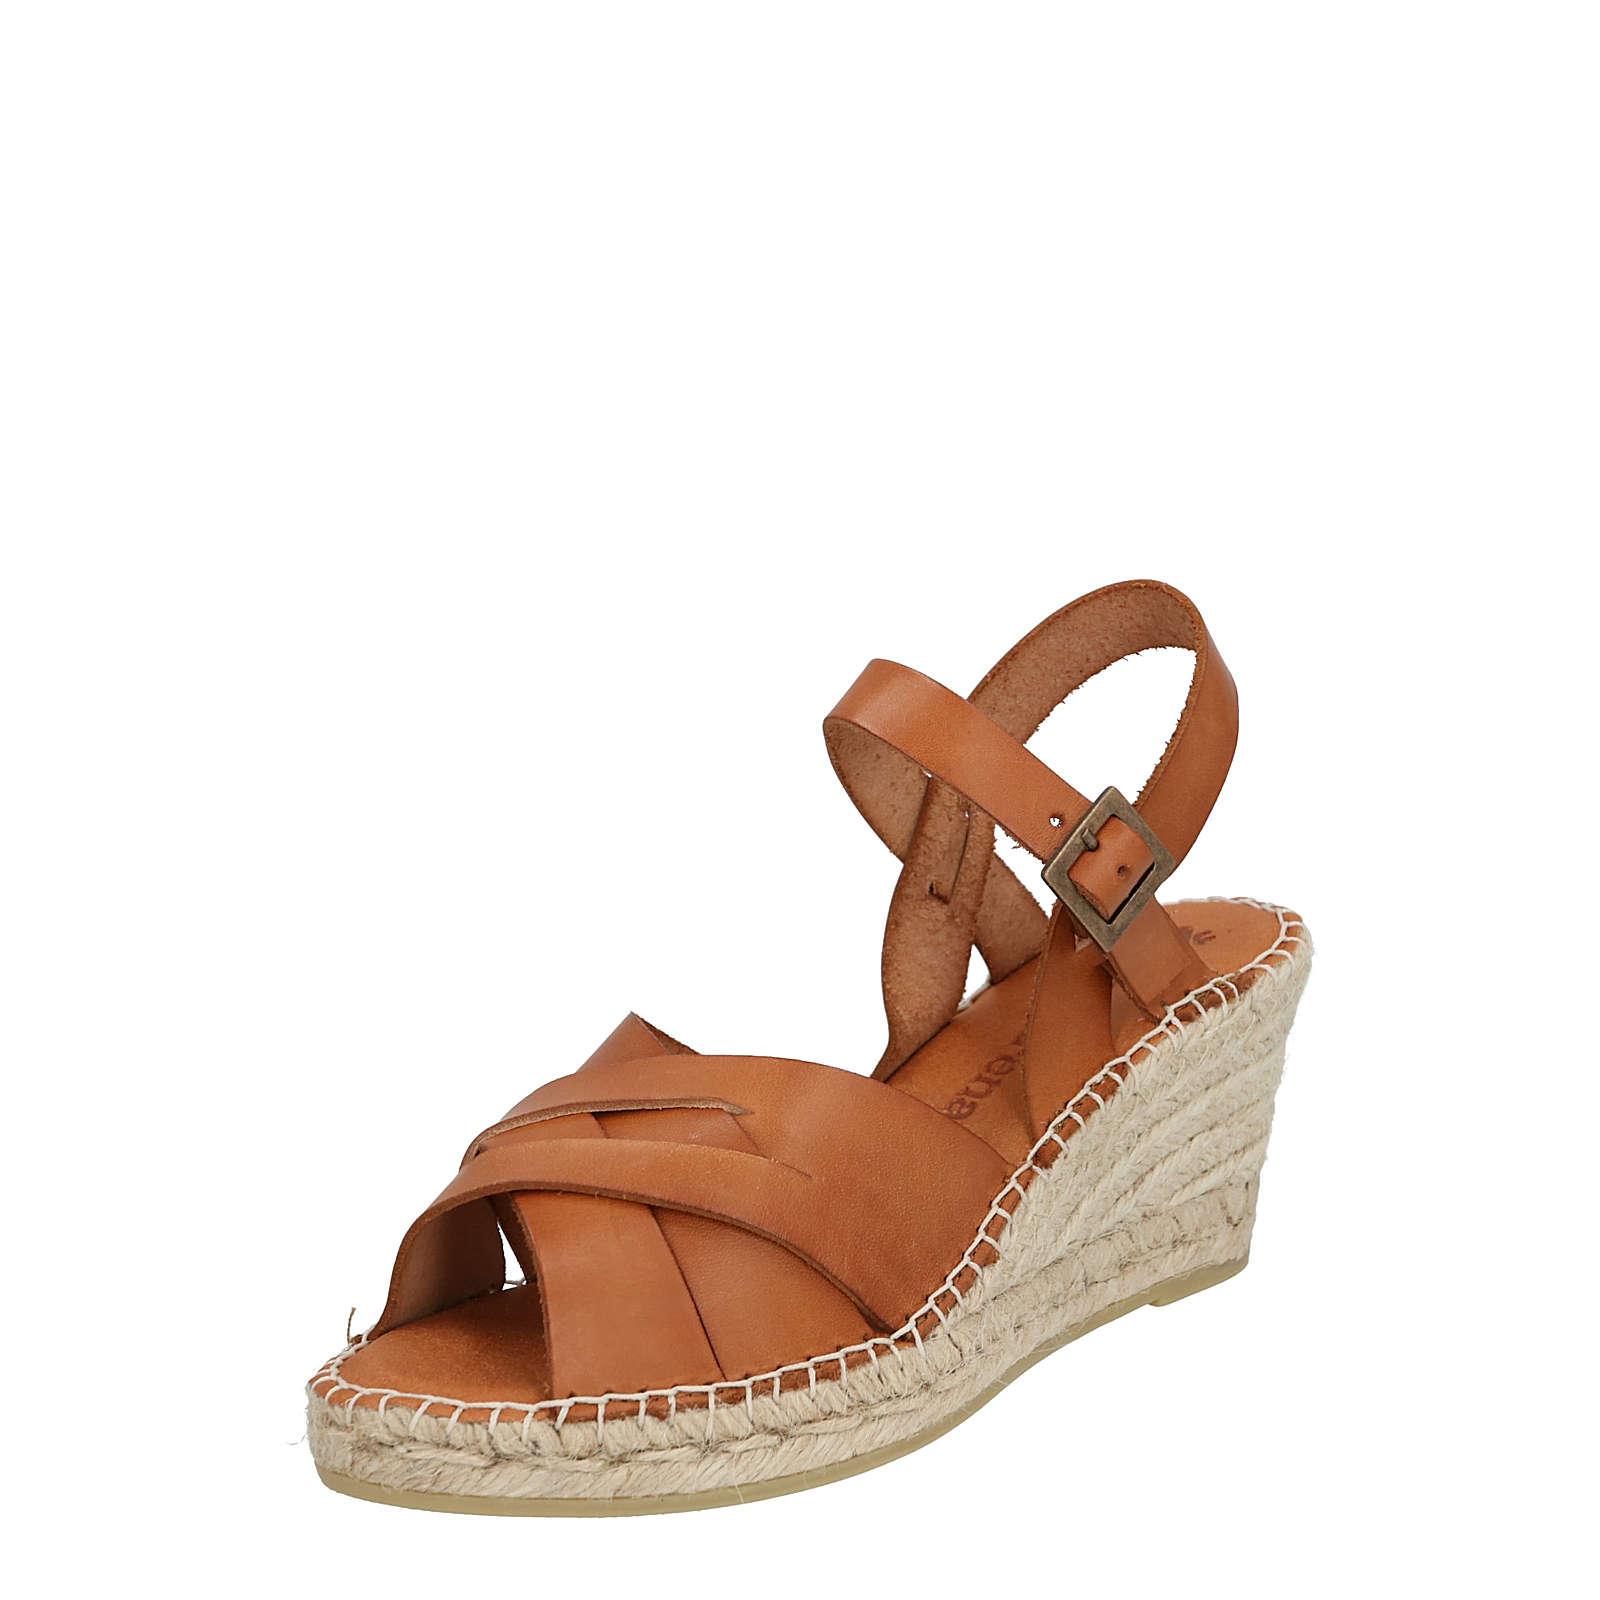 Macarena sandale ana49 Klassische Sandalen braun Damen Gr. 40